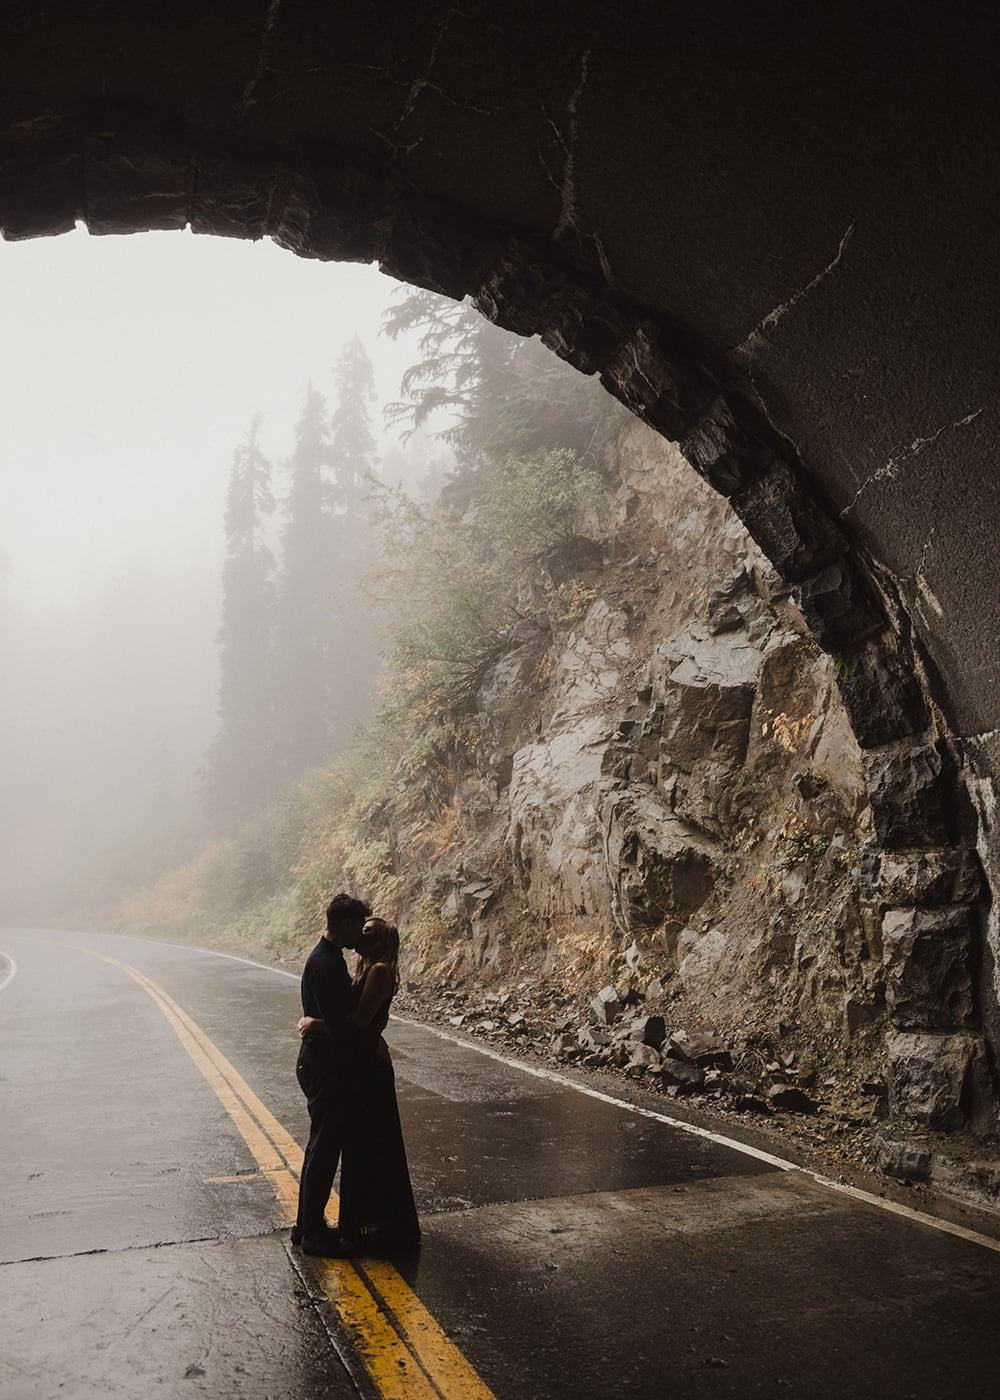 rhiannon + norris - Tipsoo Lake, Washington